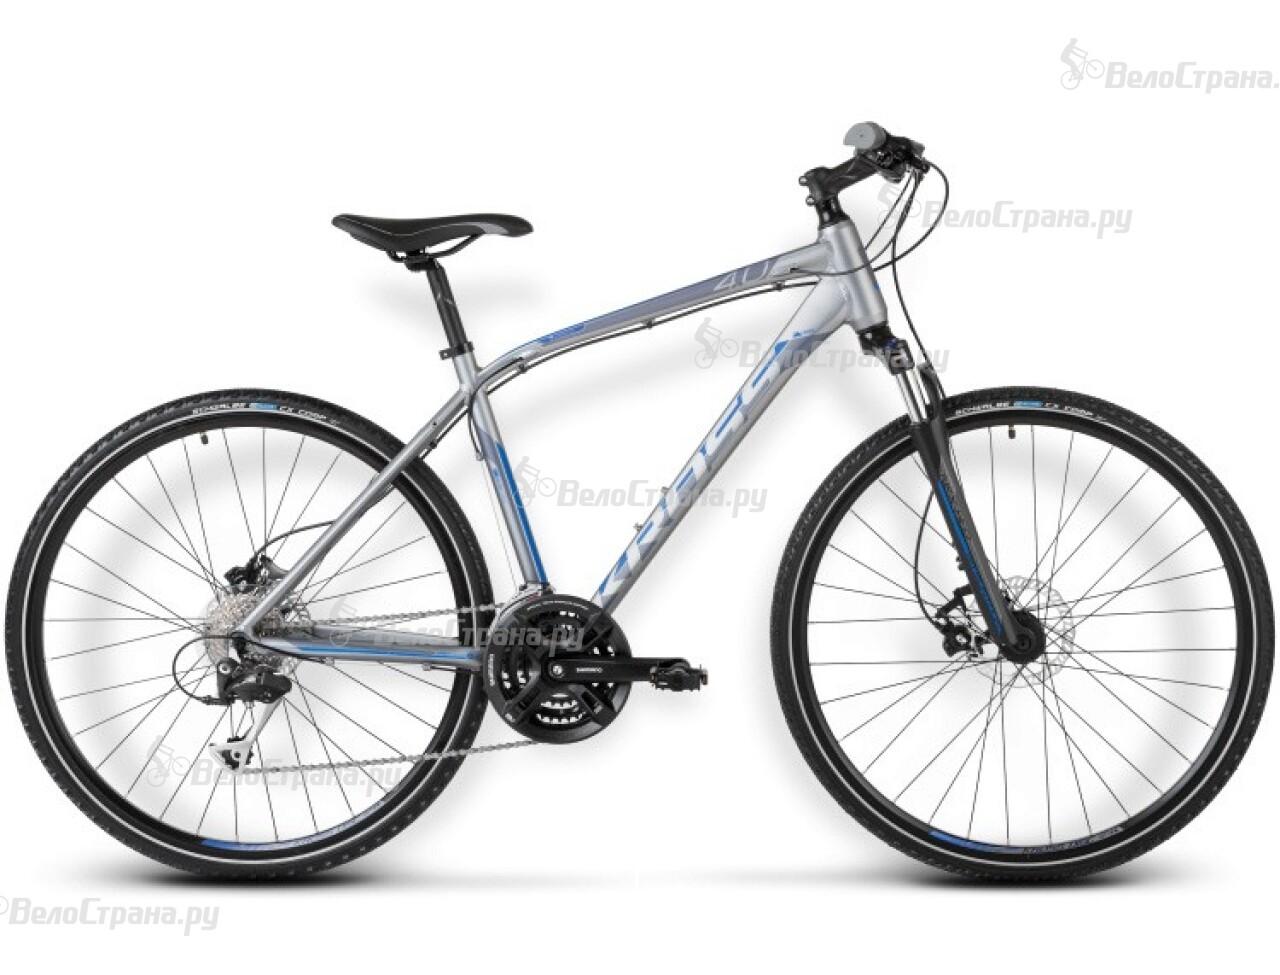 Велосипед Kross EVADO 4.0 (2016) велосипед kross evado 1 0 lady 2017